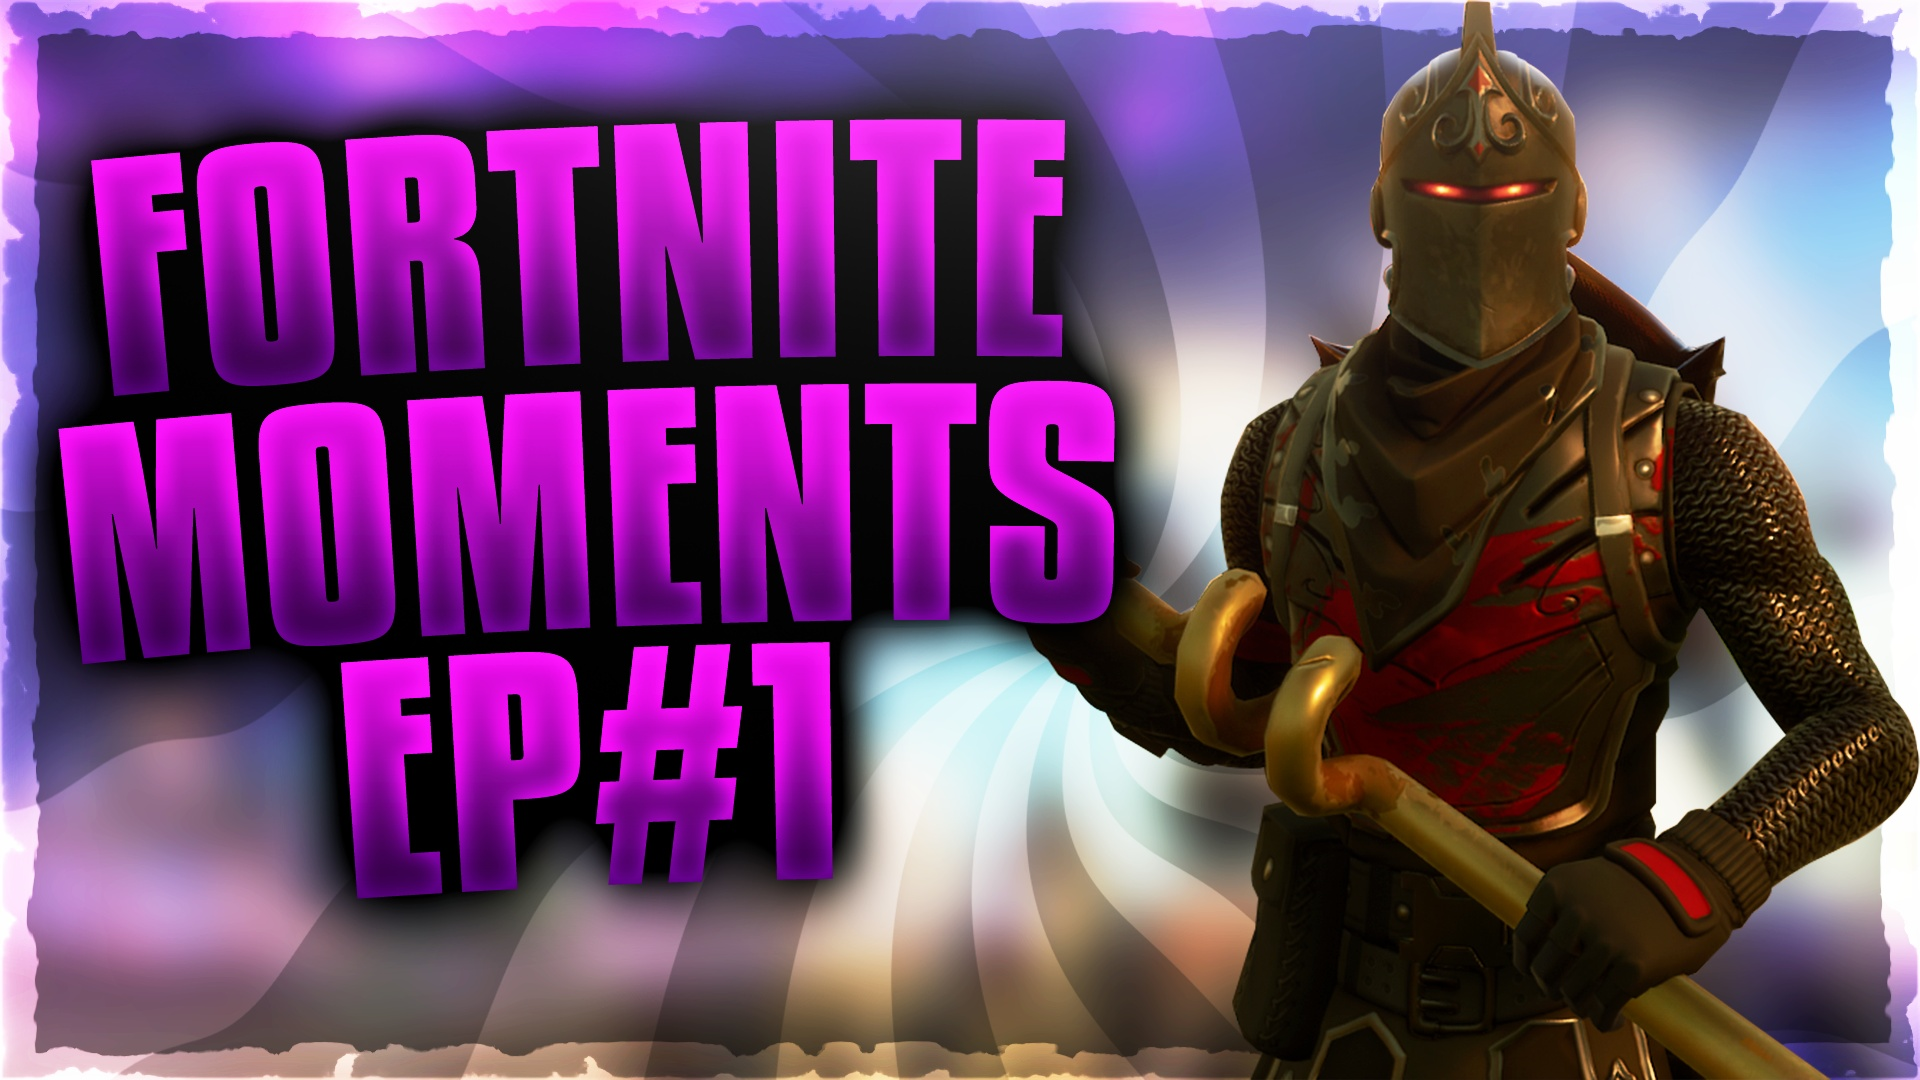 Fortnite Thumbnail Template Pack